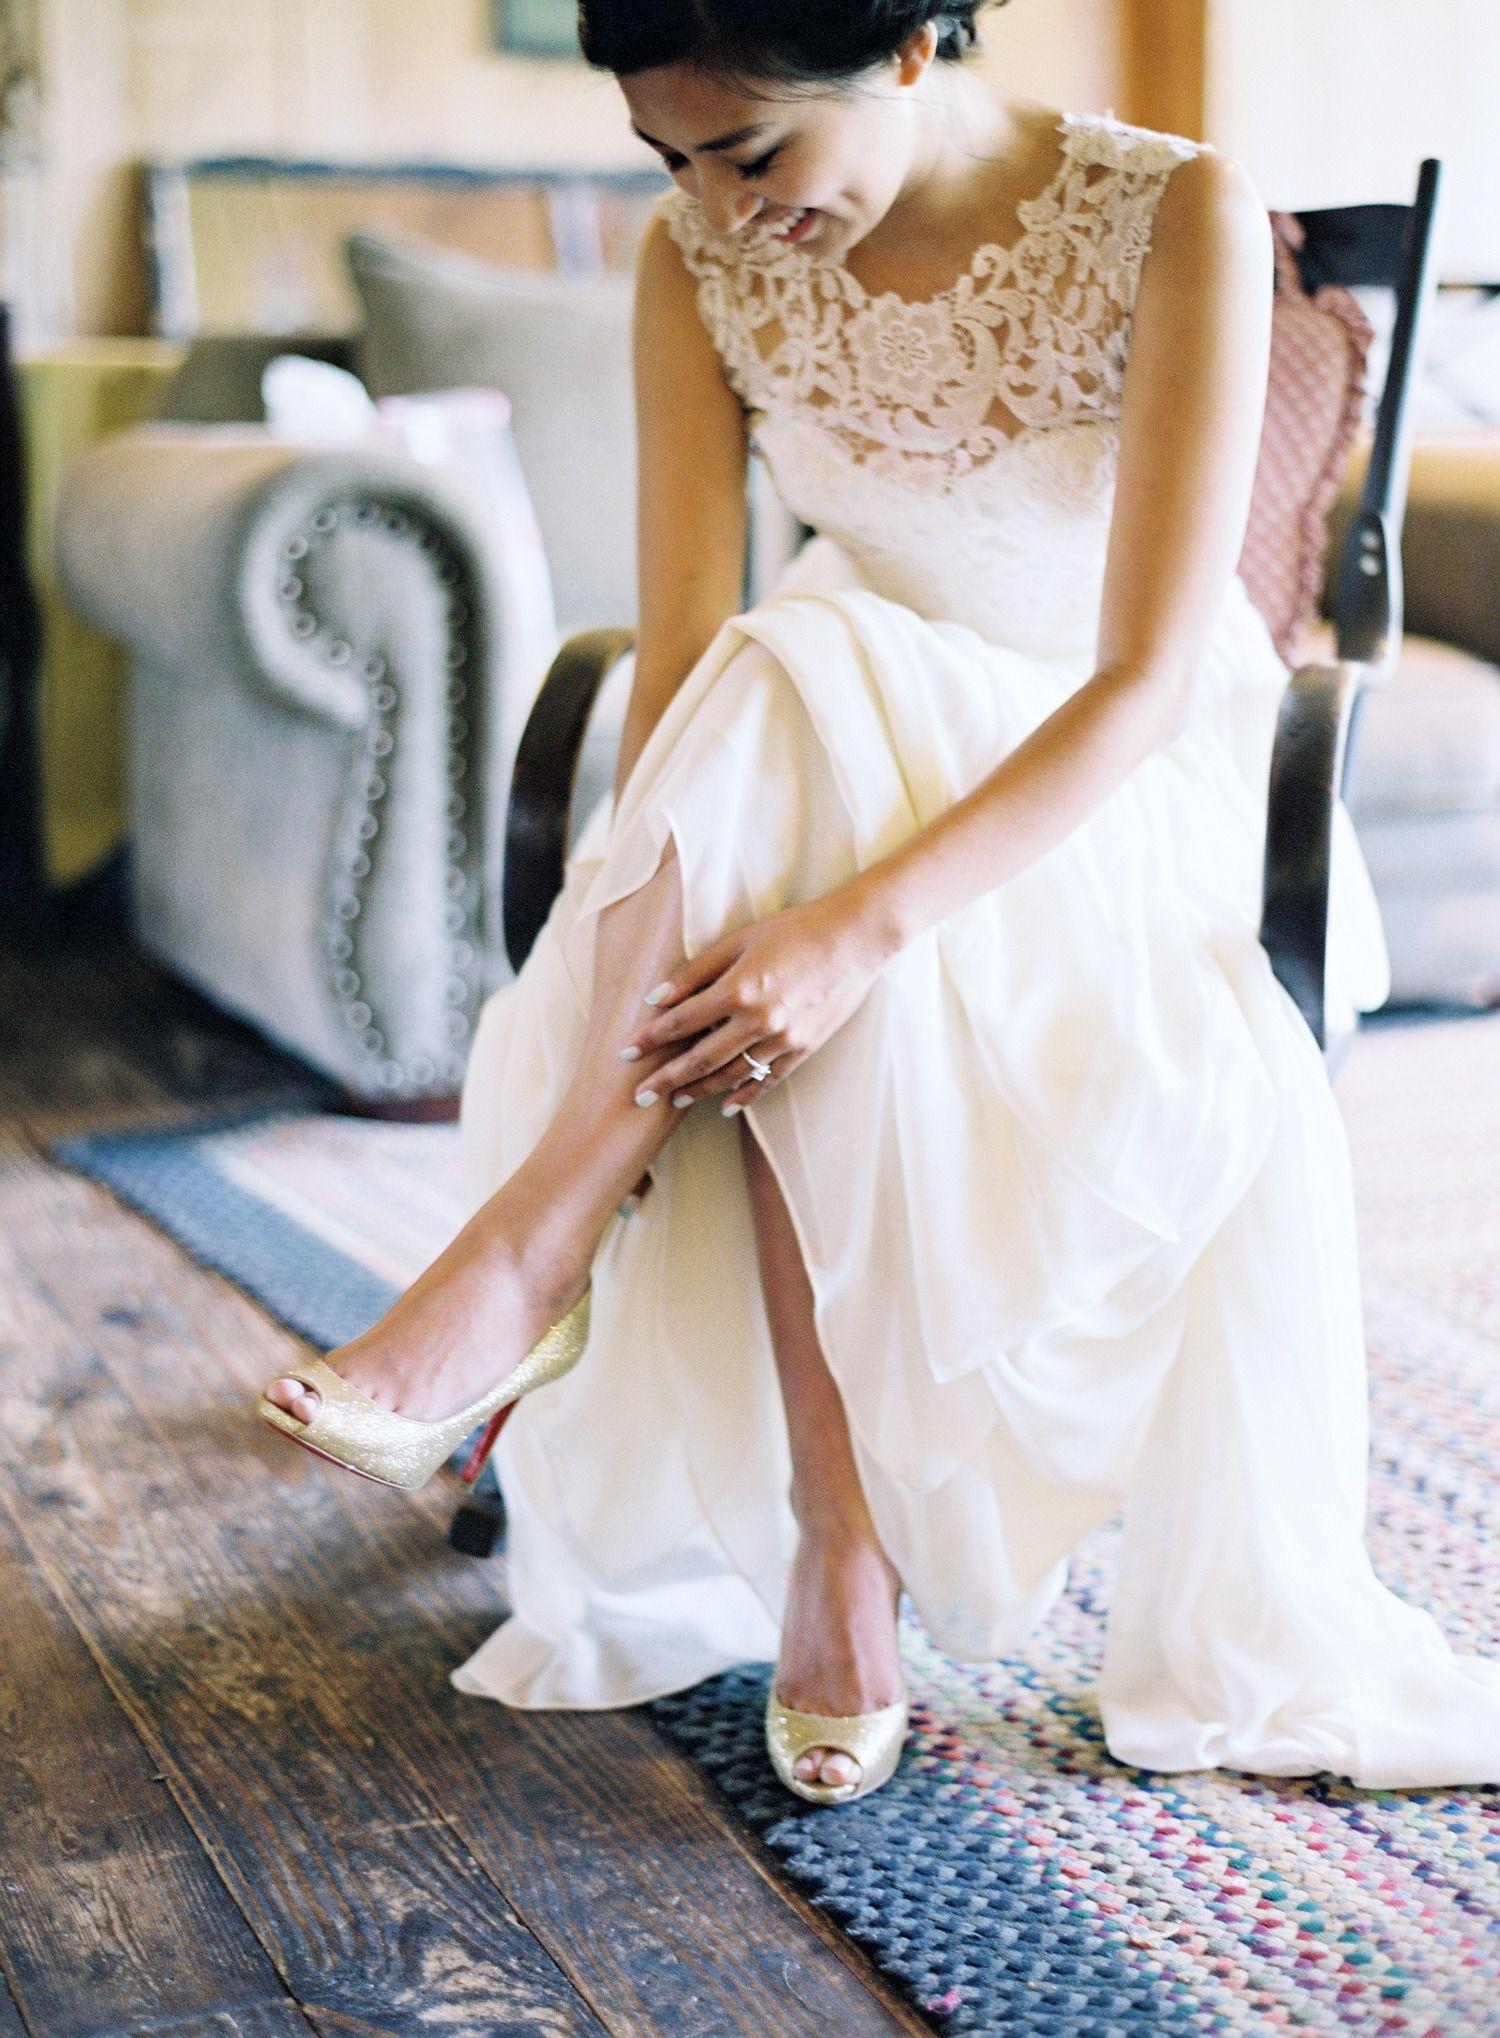 Sarah Seven wedding dress from lovelybride.com | Read More: http://www.stylemepretty.com/2014/09/12/elegant-crossed-keys-inn-wedding/ | Photography: Matthew And Bo Of CLY BY MATTHEW - www.clybymatthew.com